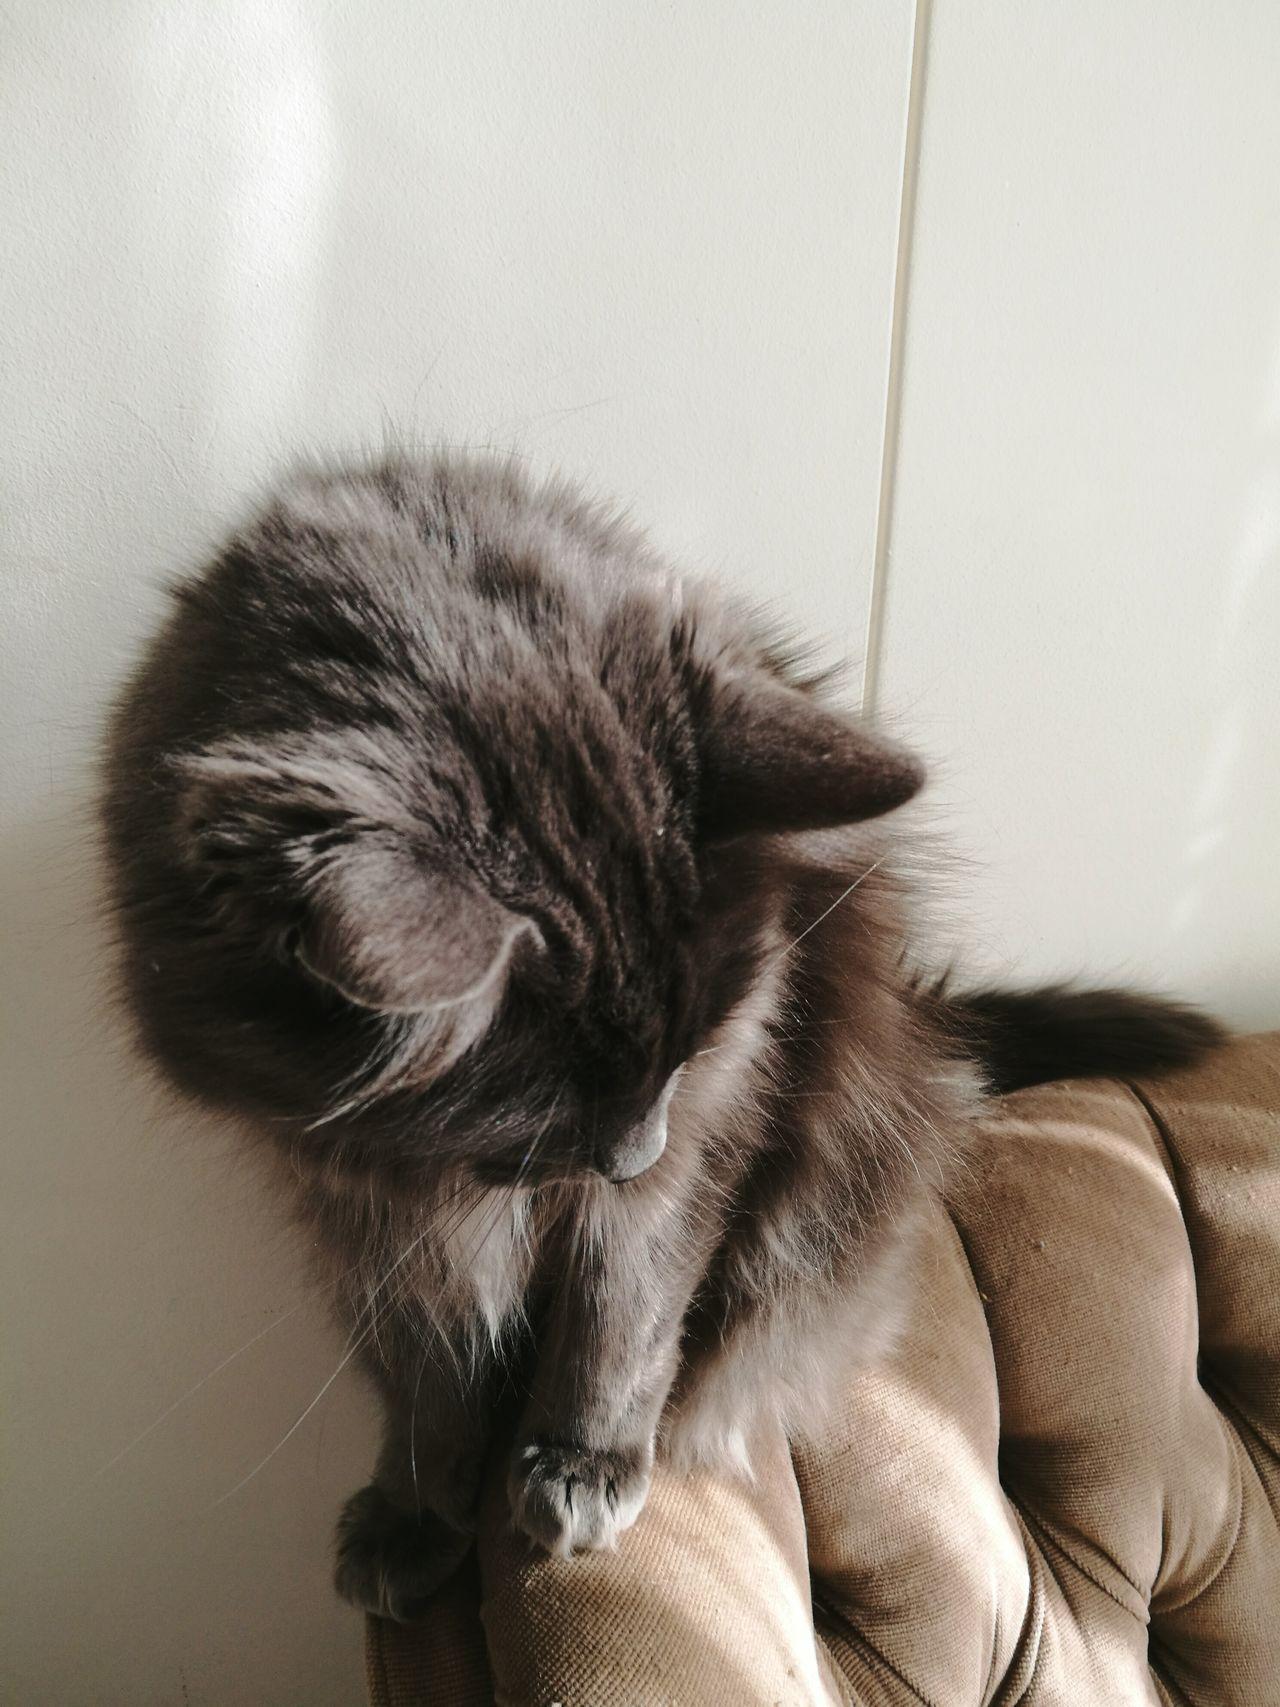 Catsofinstagram Cat♡ Cat Lovers Catoftheday Cats Of EyeEm Cat Watching Catstagram Armchair Grey Cat Catfur Sunnycat First Eyeem Photo Cat Fur Onecataday